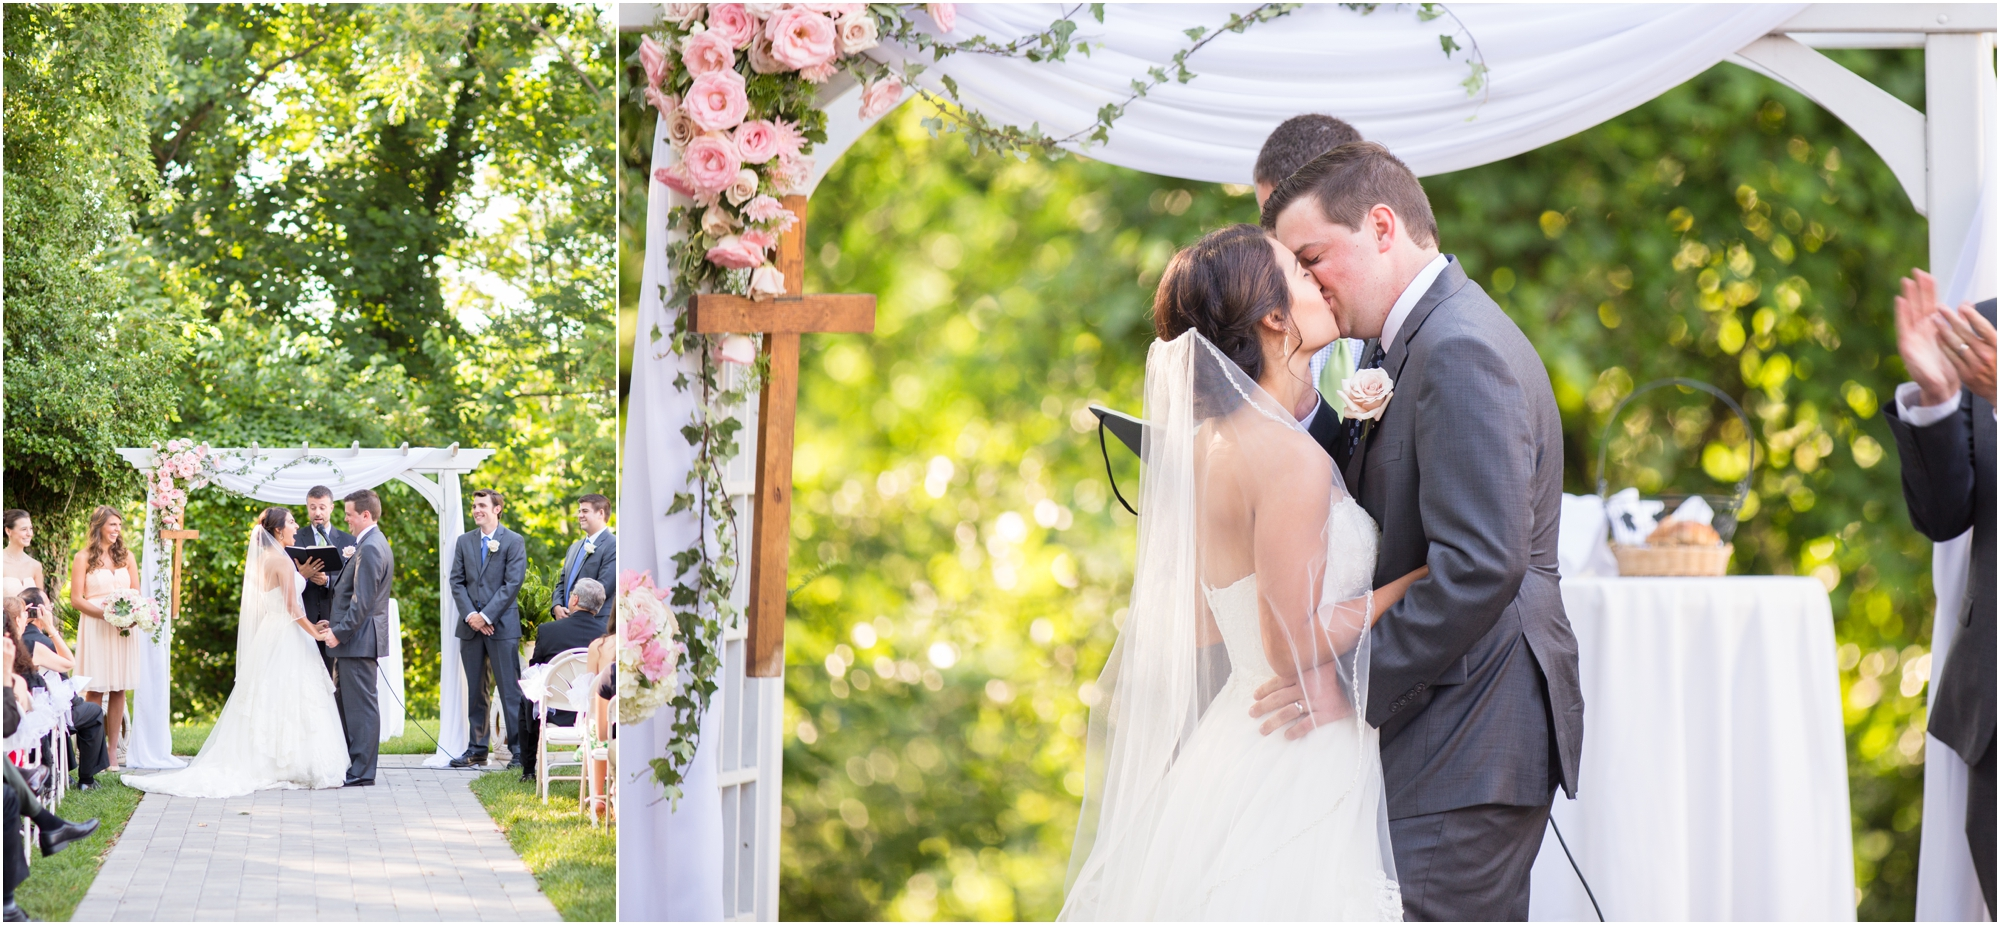 4-Mann Wedding Ceremony-349.jpg